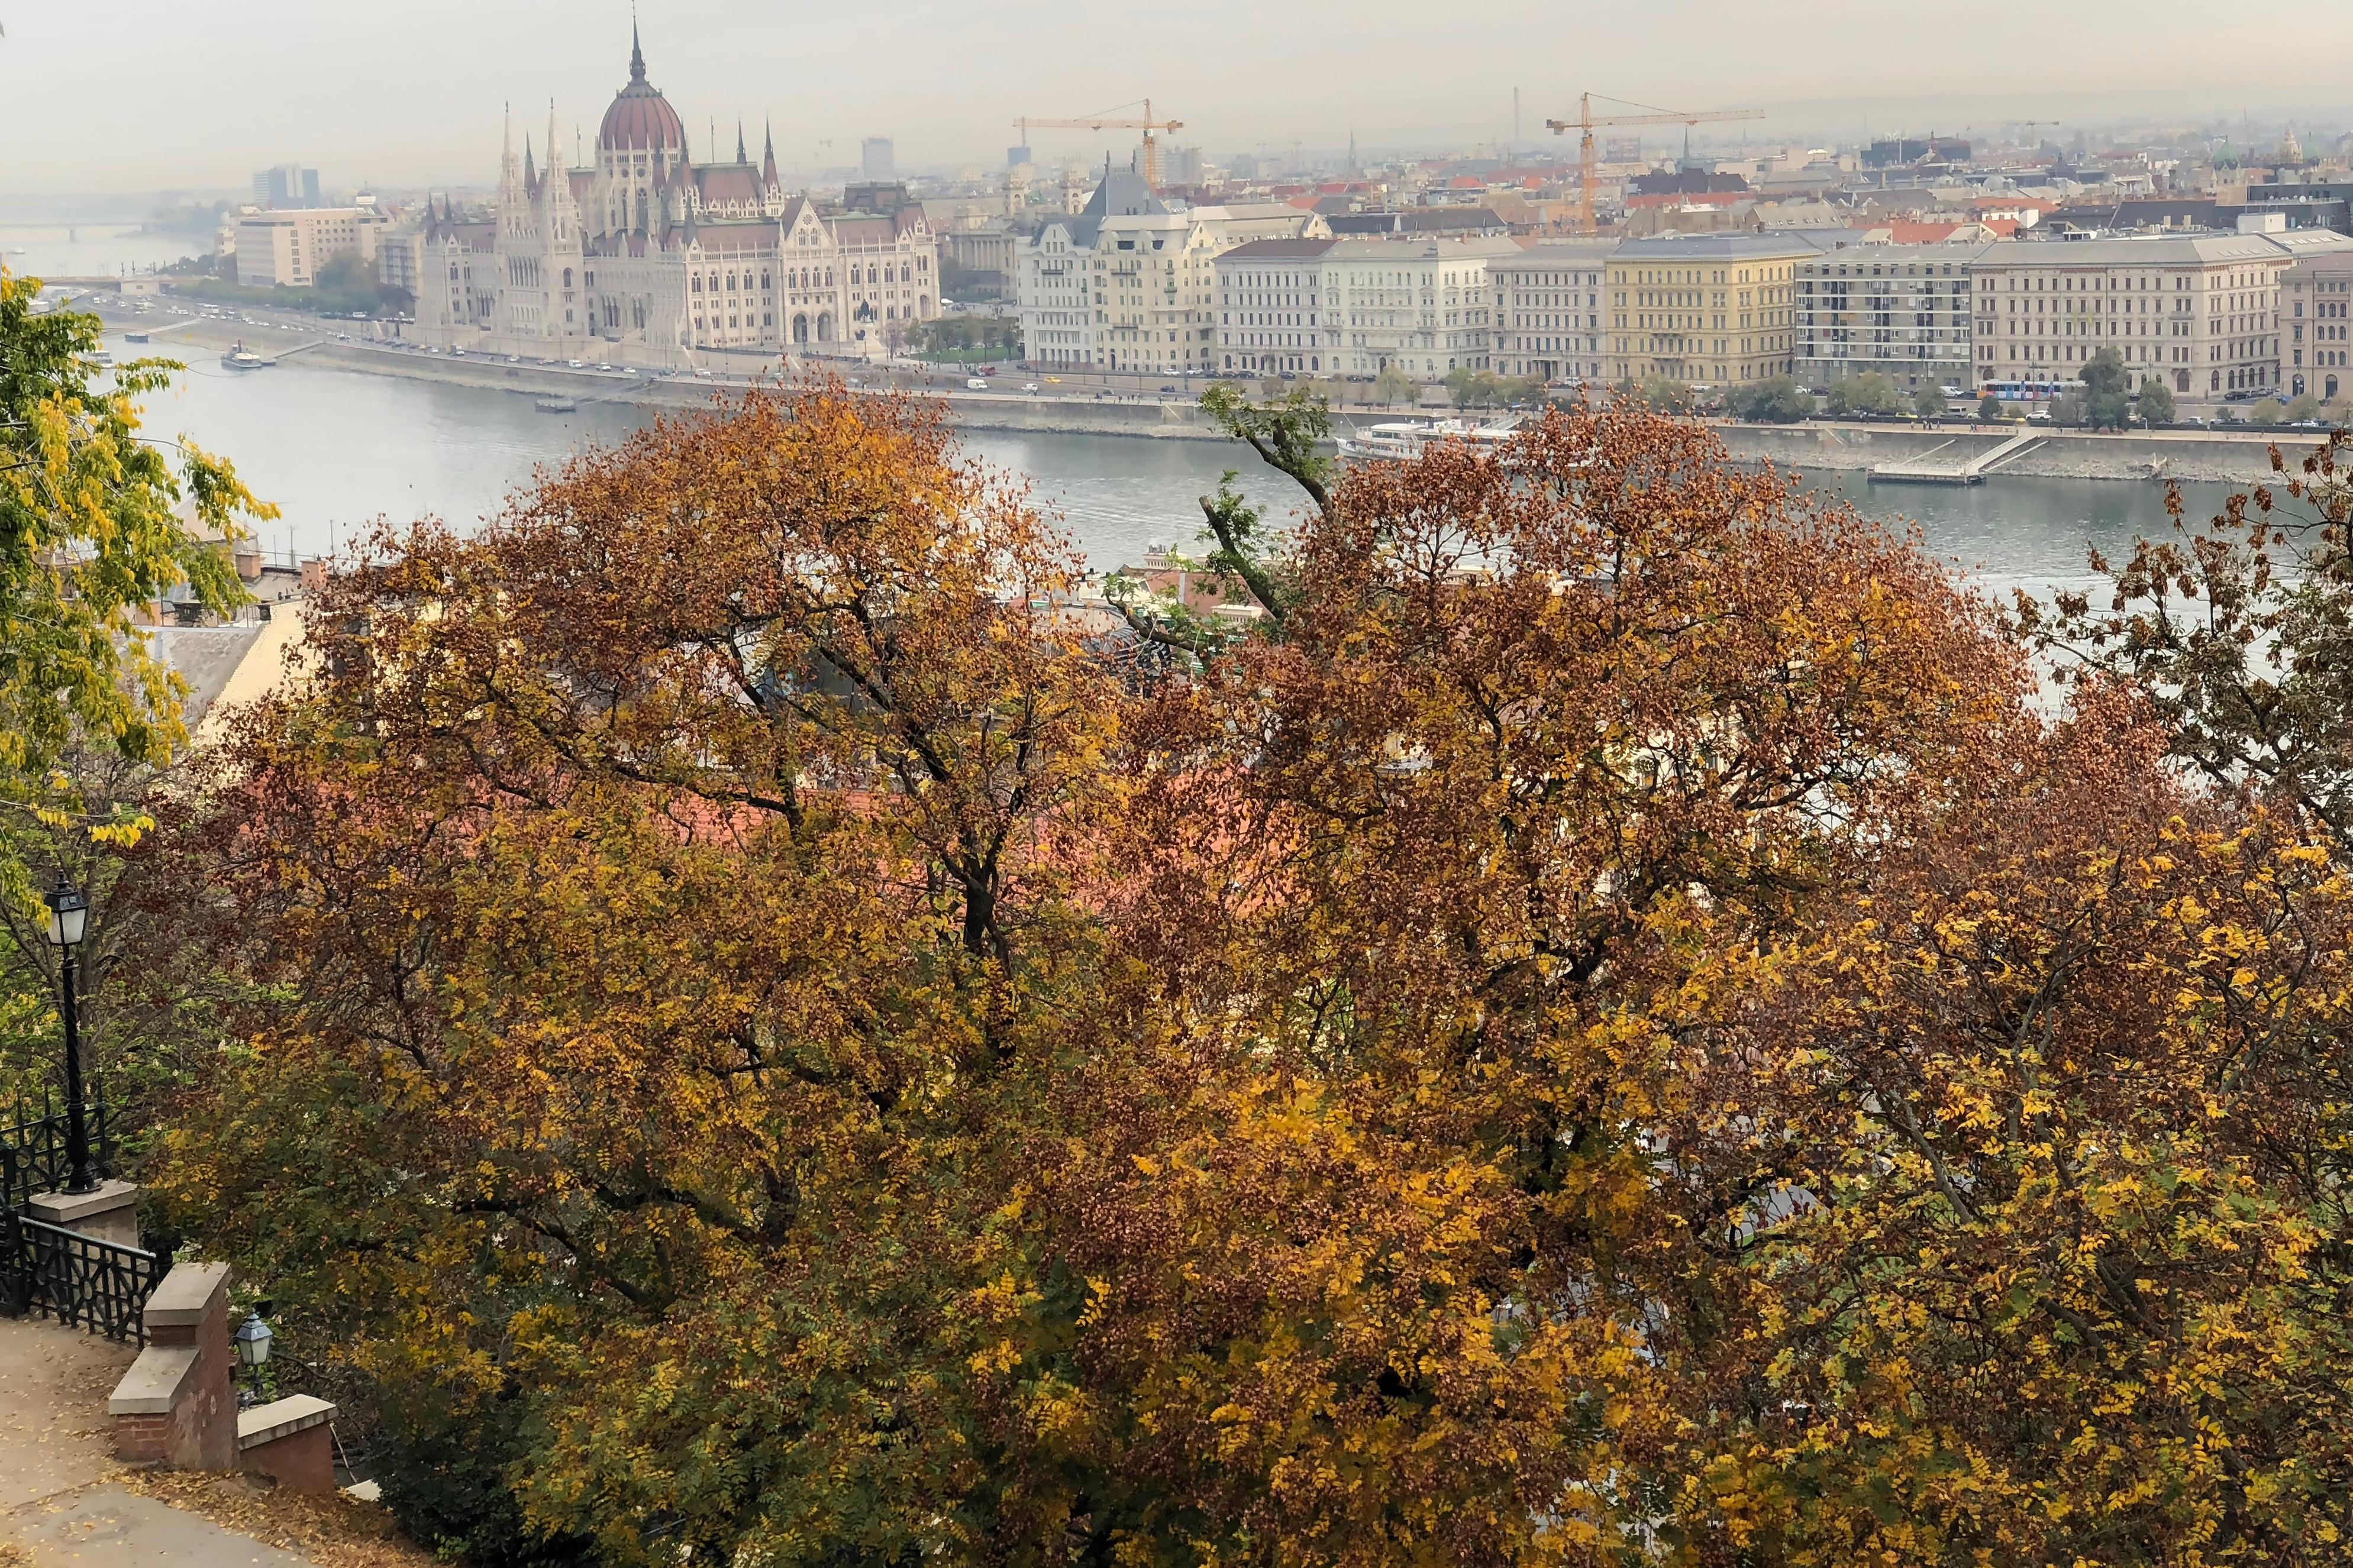 Budapesti képek